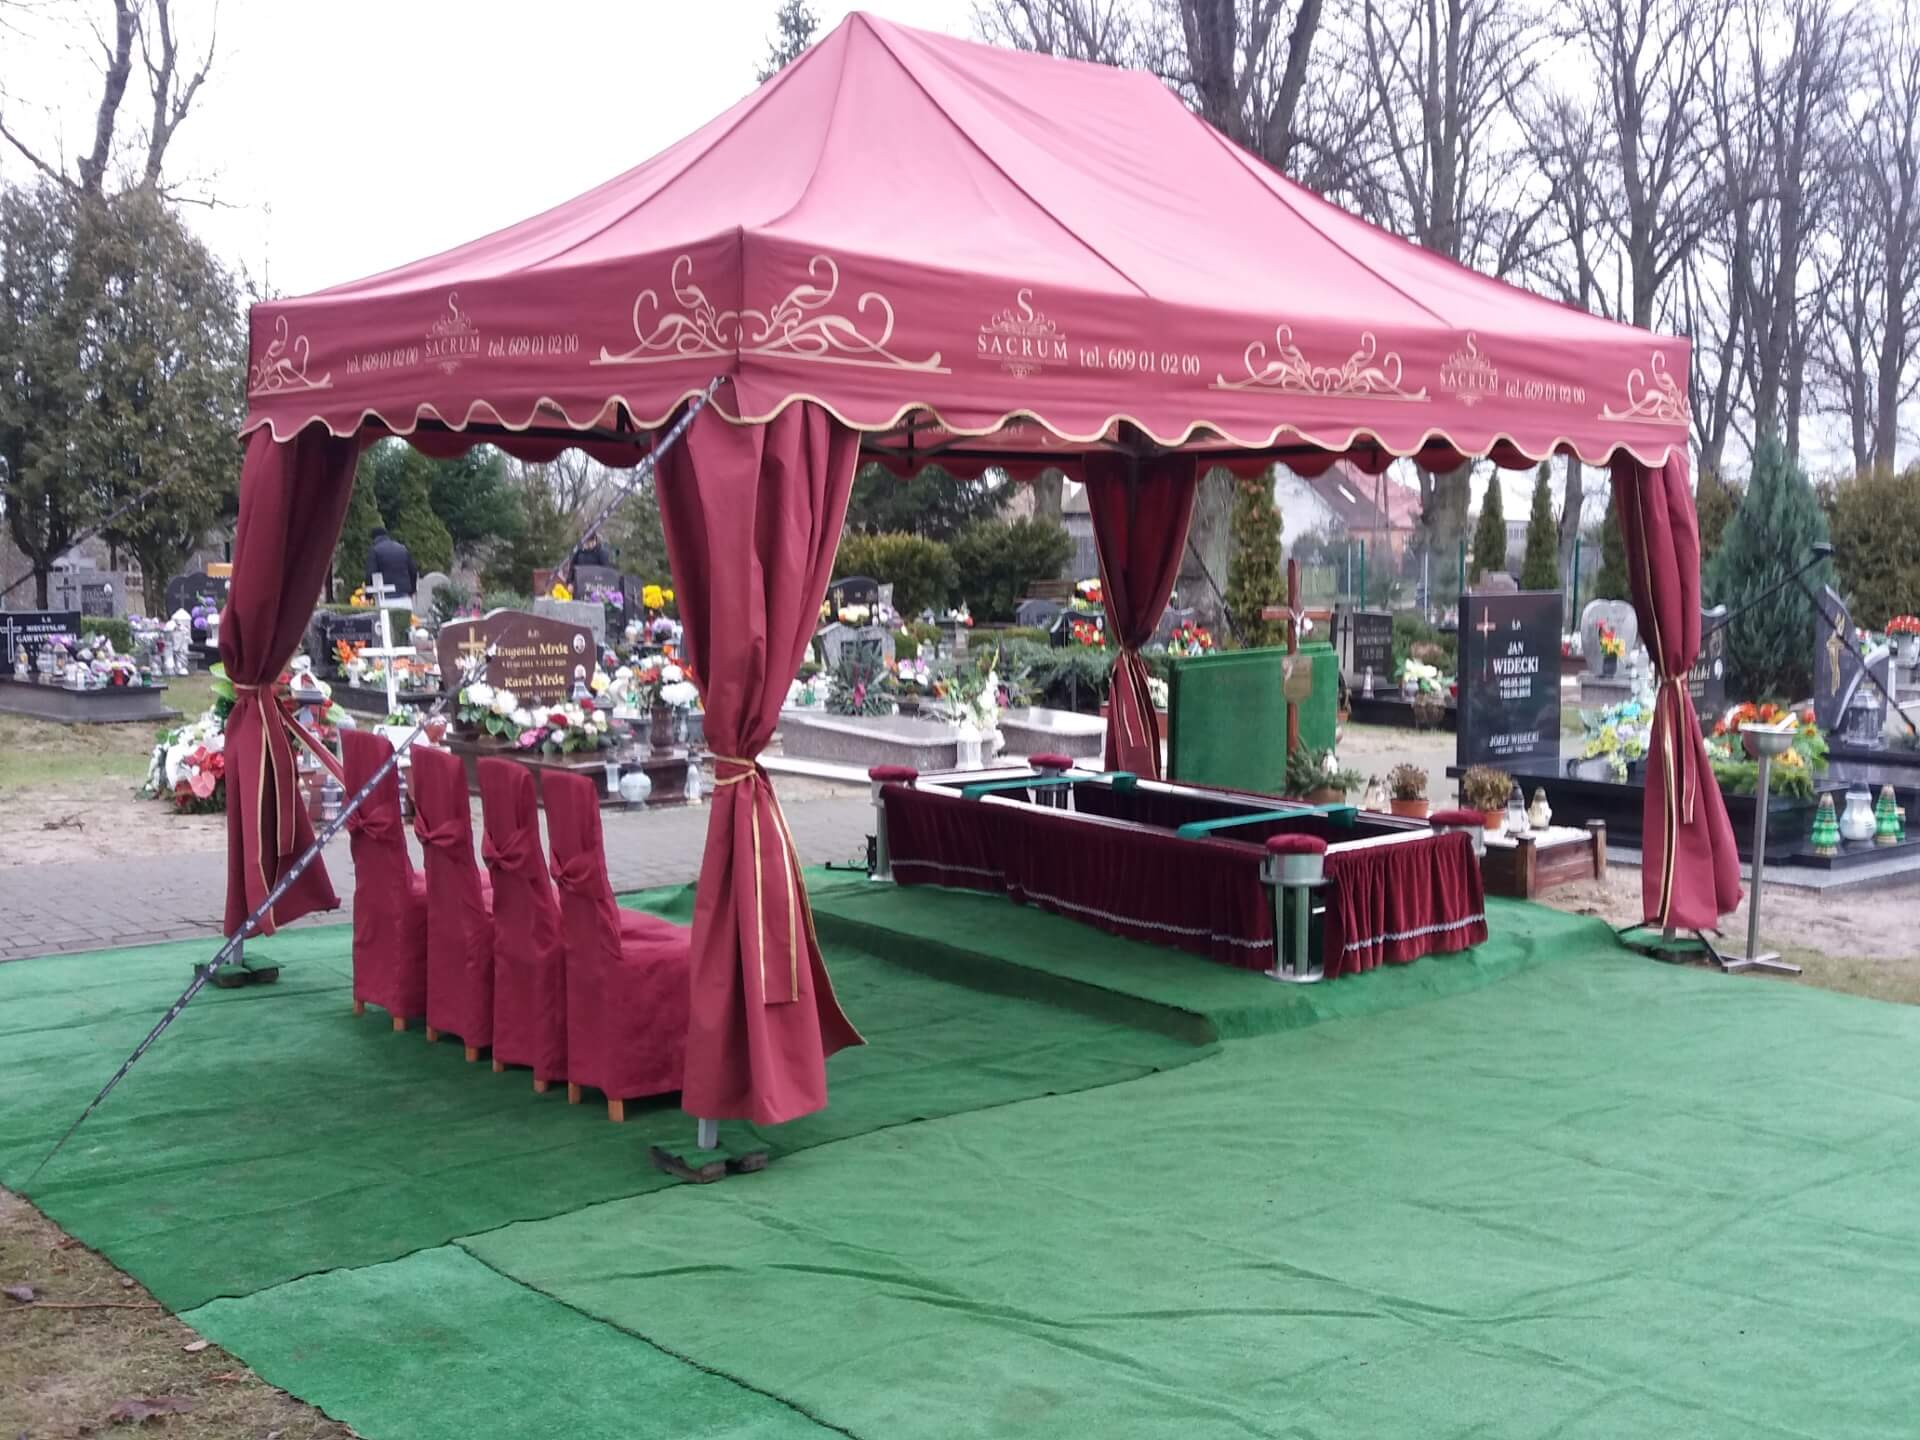 uslugi pogrzebowe sacrum 8